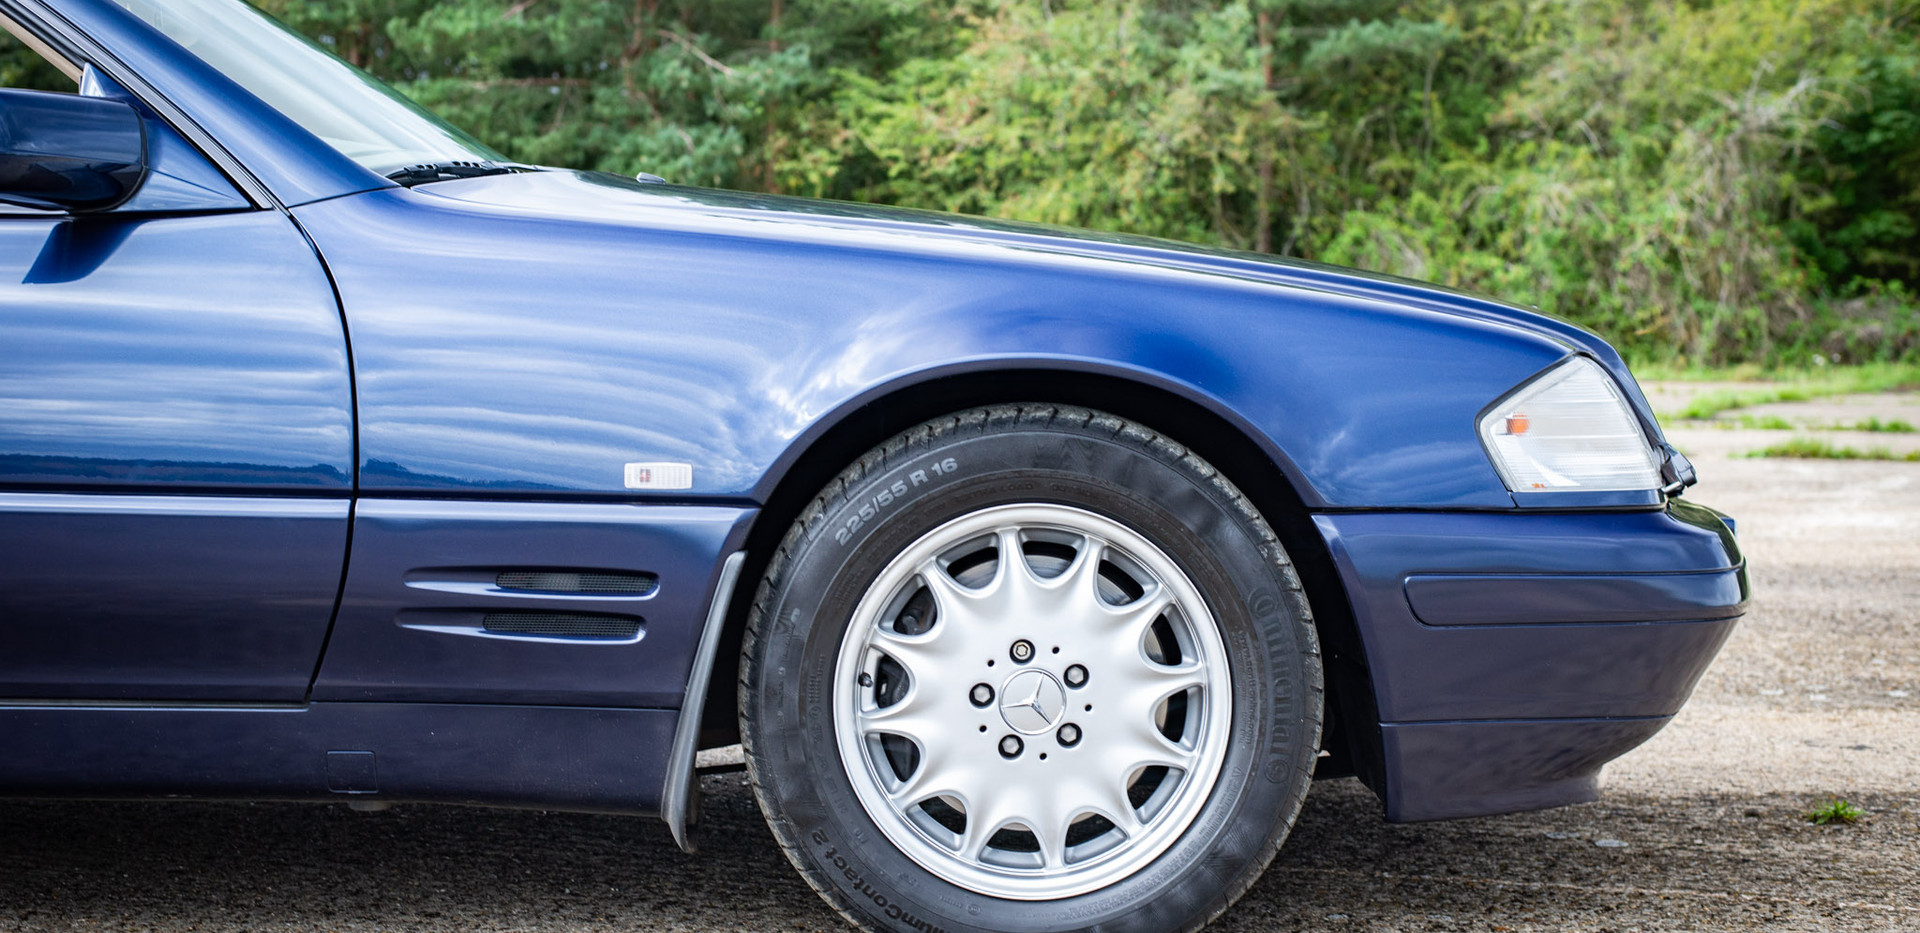 R129 SL500 R201 OWT - FOR SALE UK LONDON